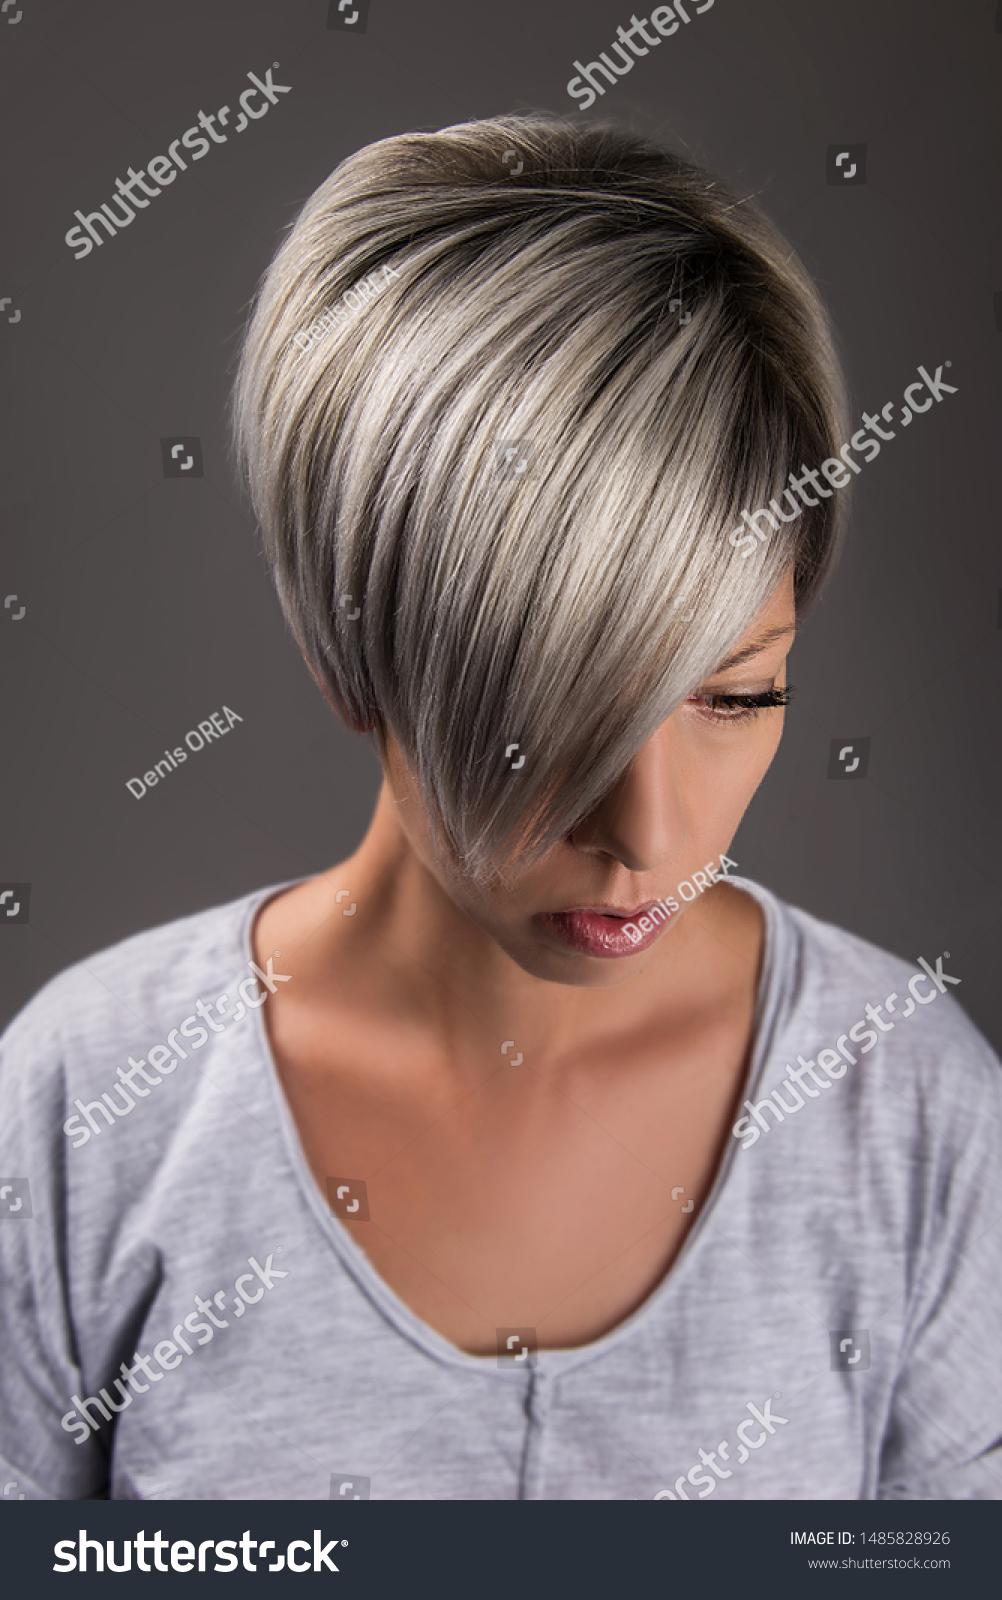 Short Hair Style Hair Cut Grey Stock Photo Edit Now 1485828926